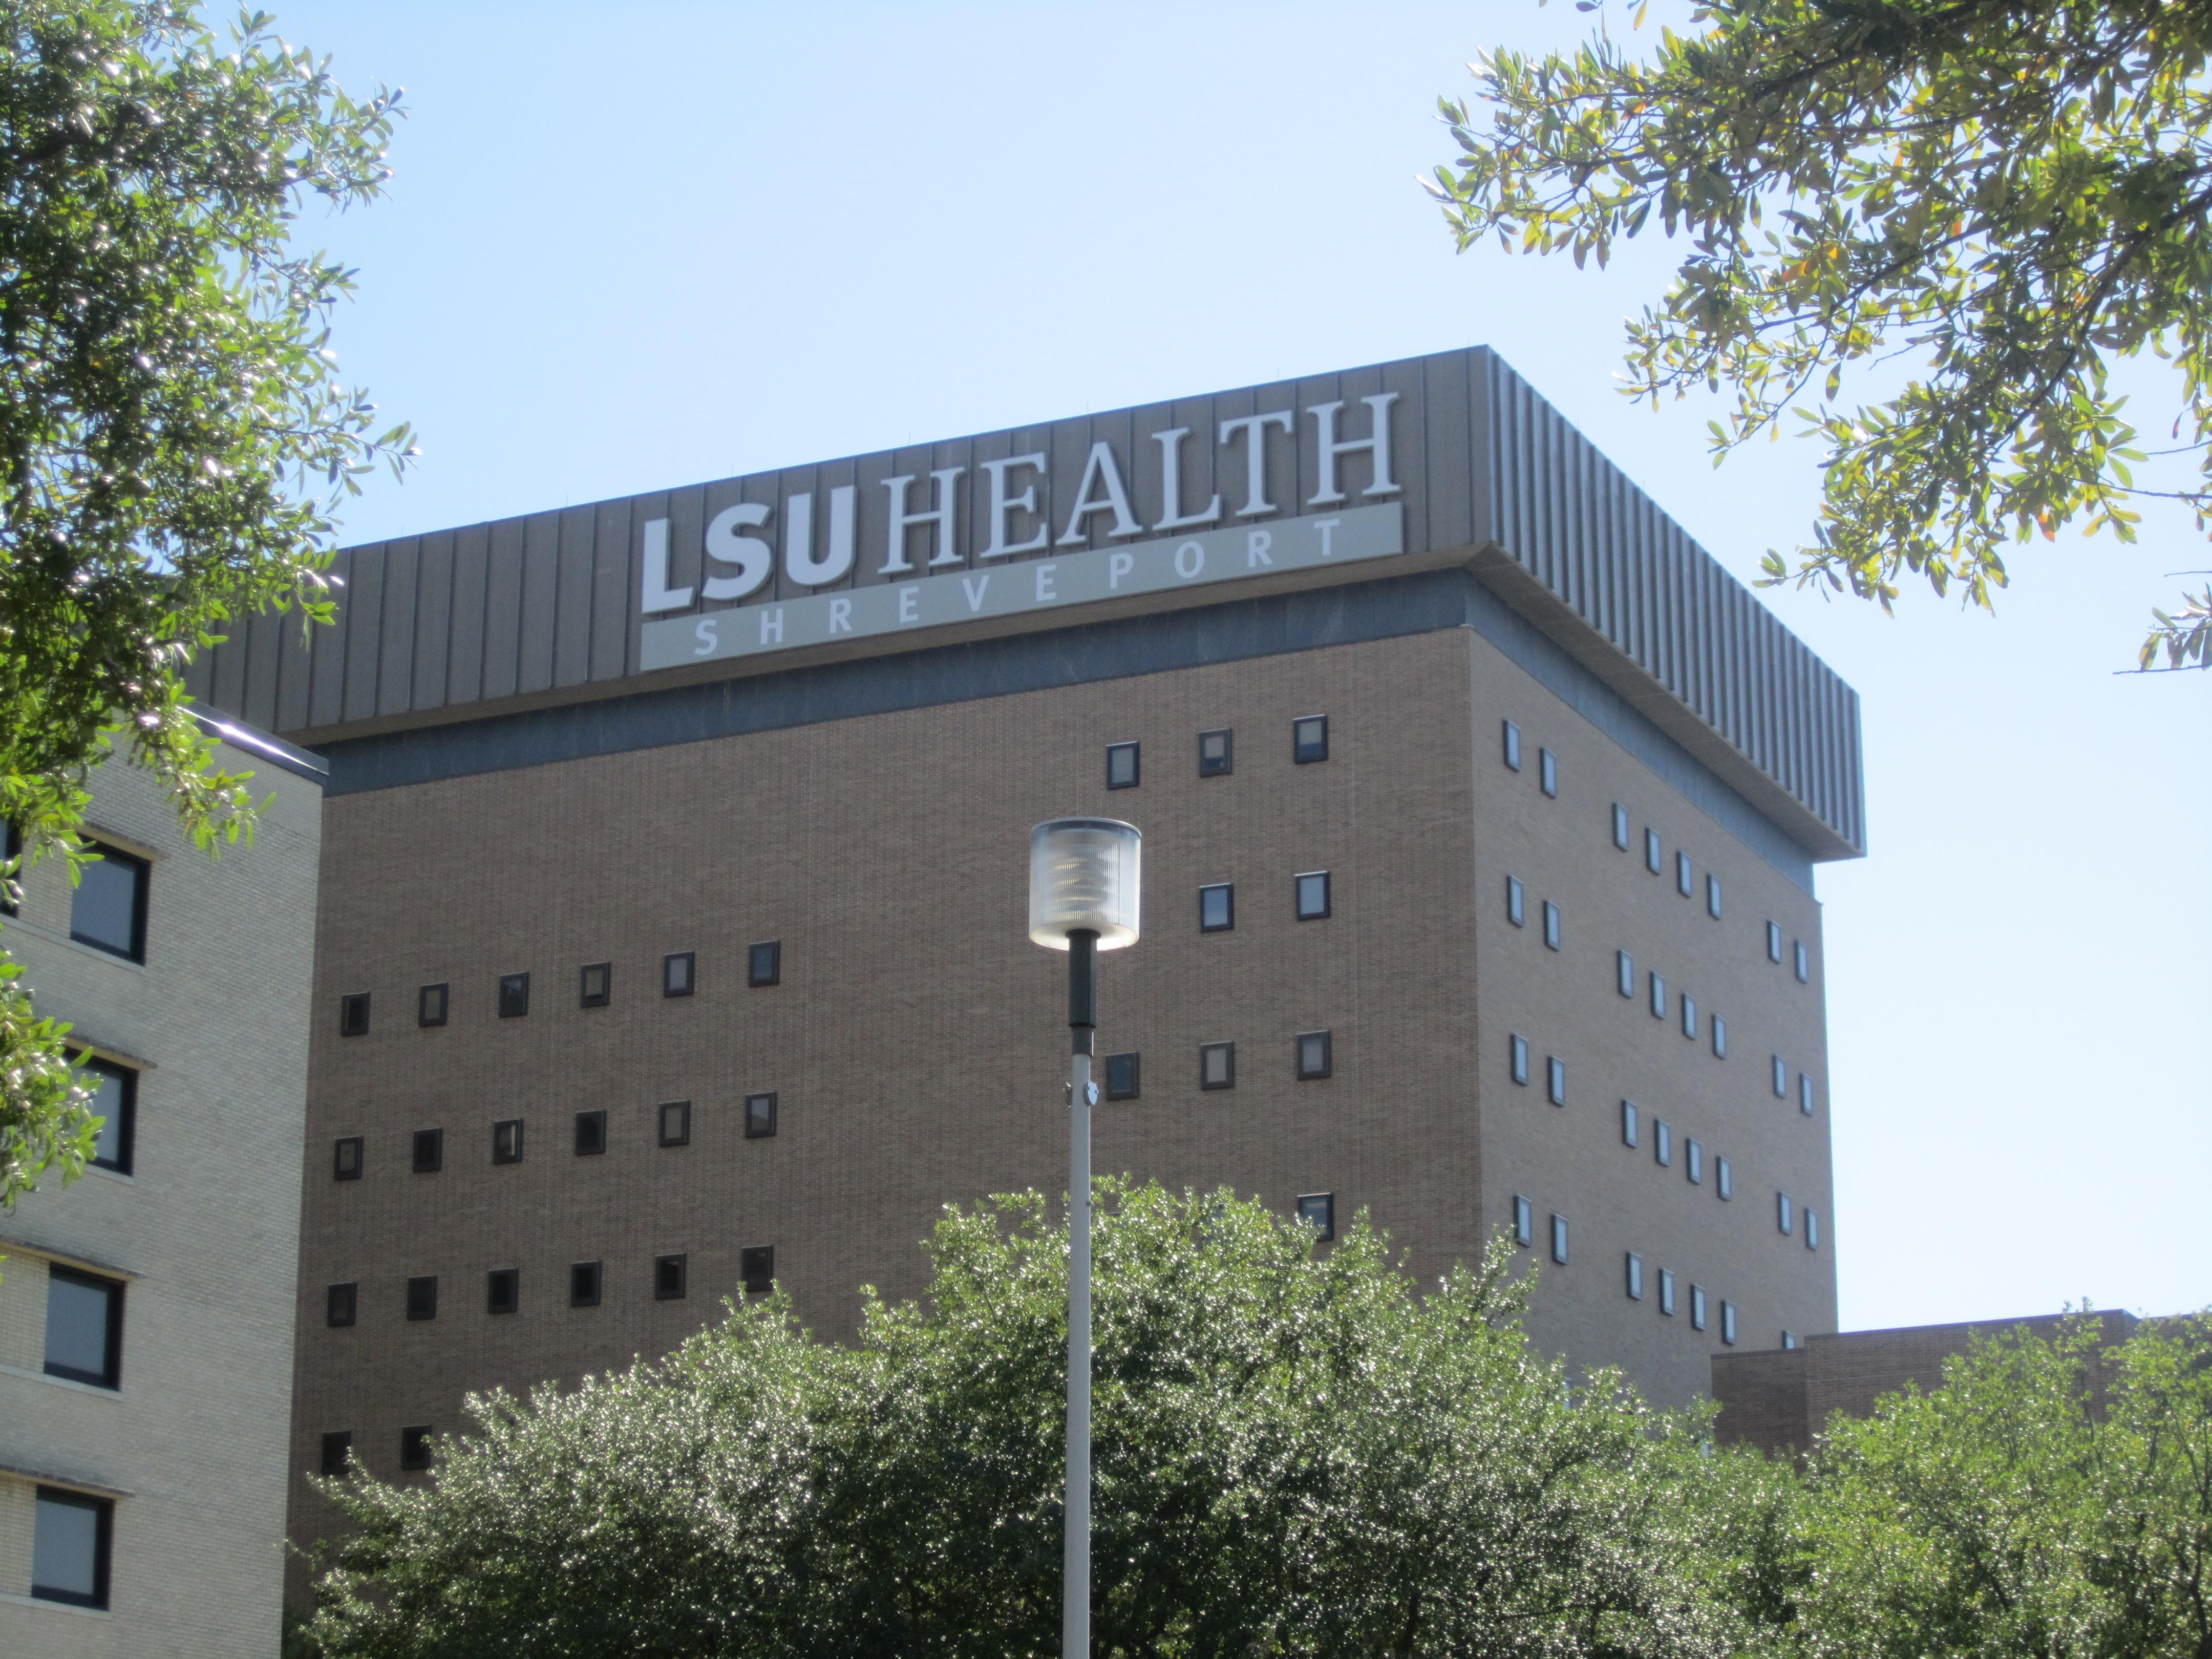 LSU Health Sciences Center Shreveport - Wikipedia